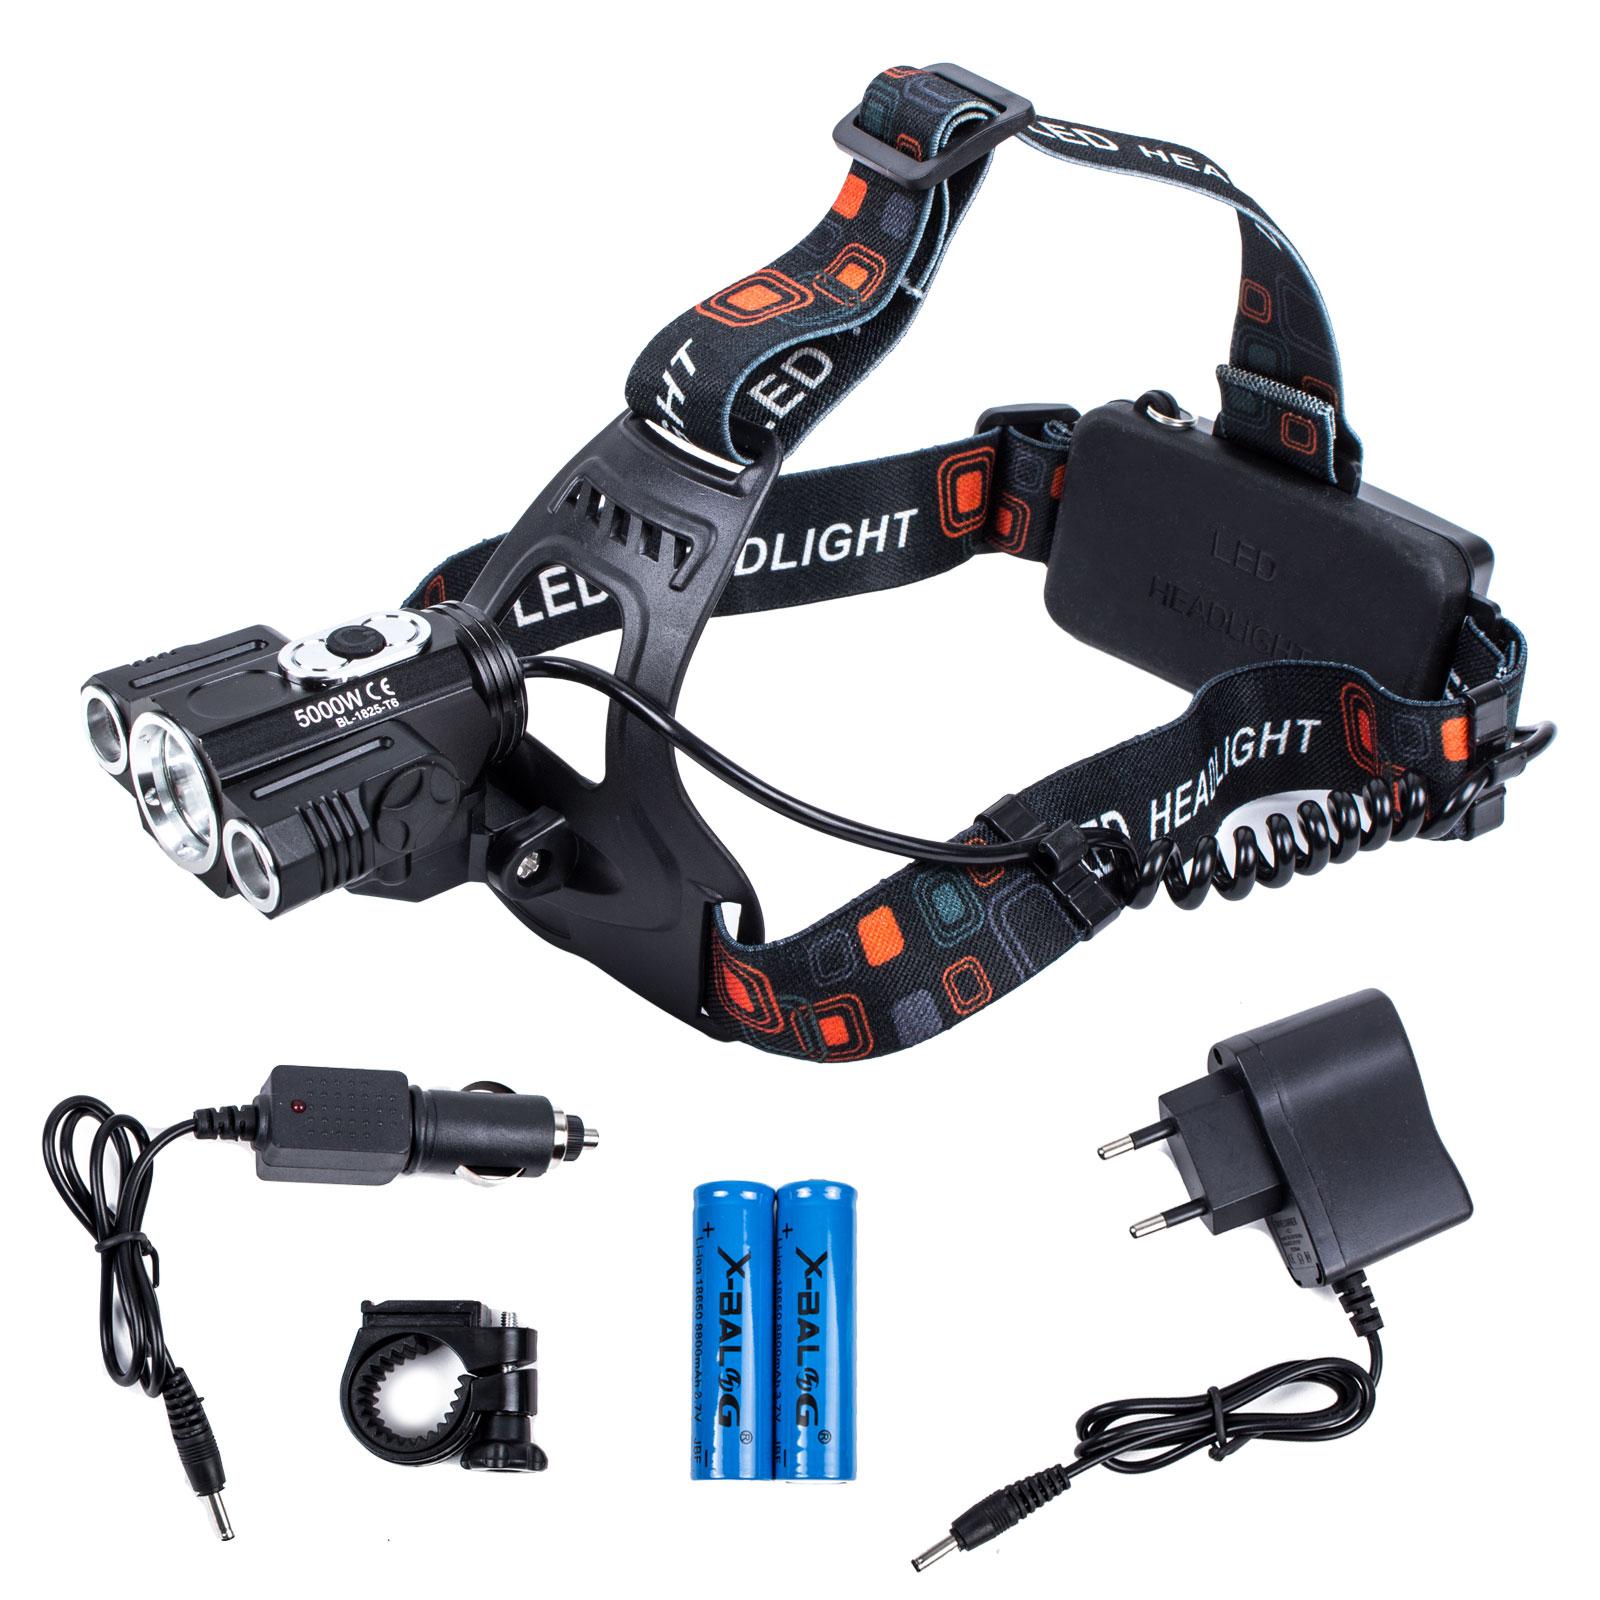 T6 LED Kopflampe + KFZ Ladegerät + Netzteil + Akkus + Lenkeradapter